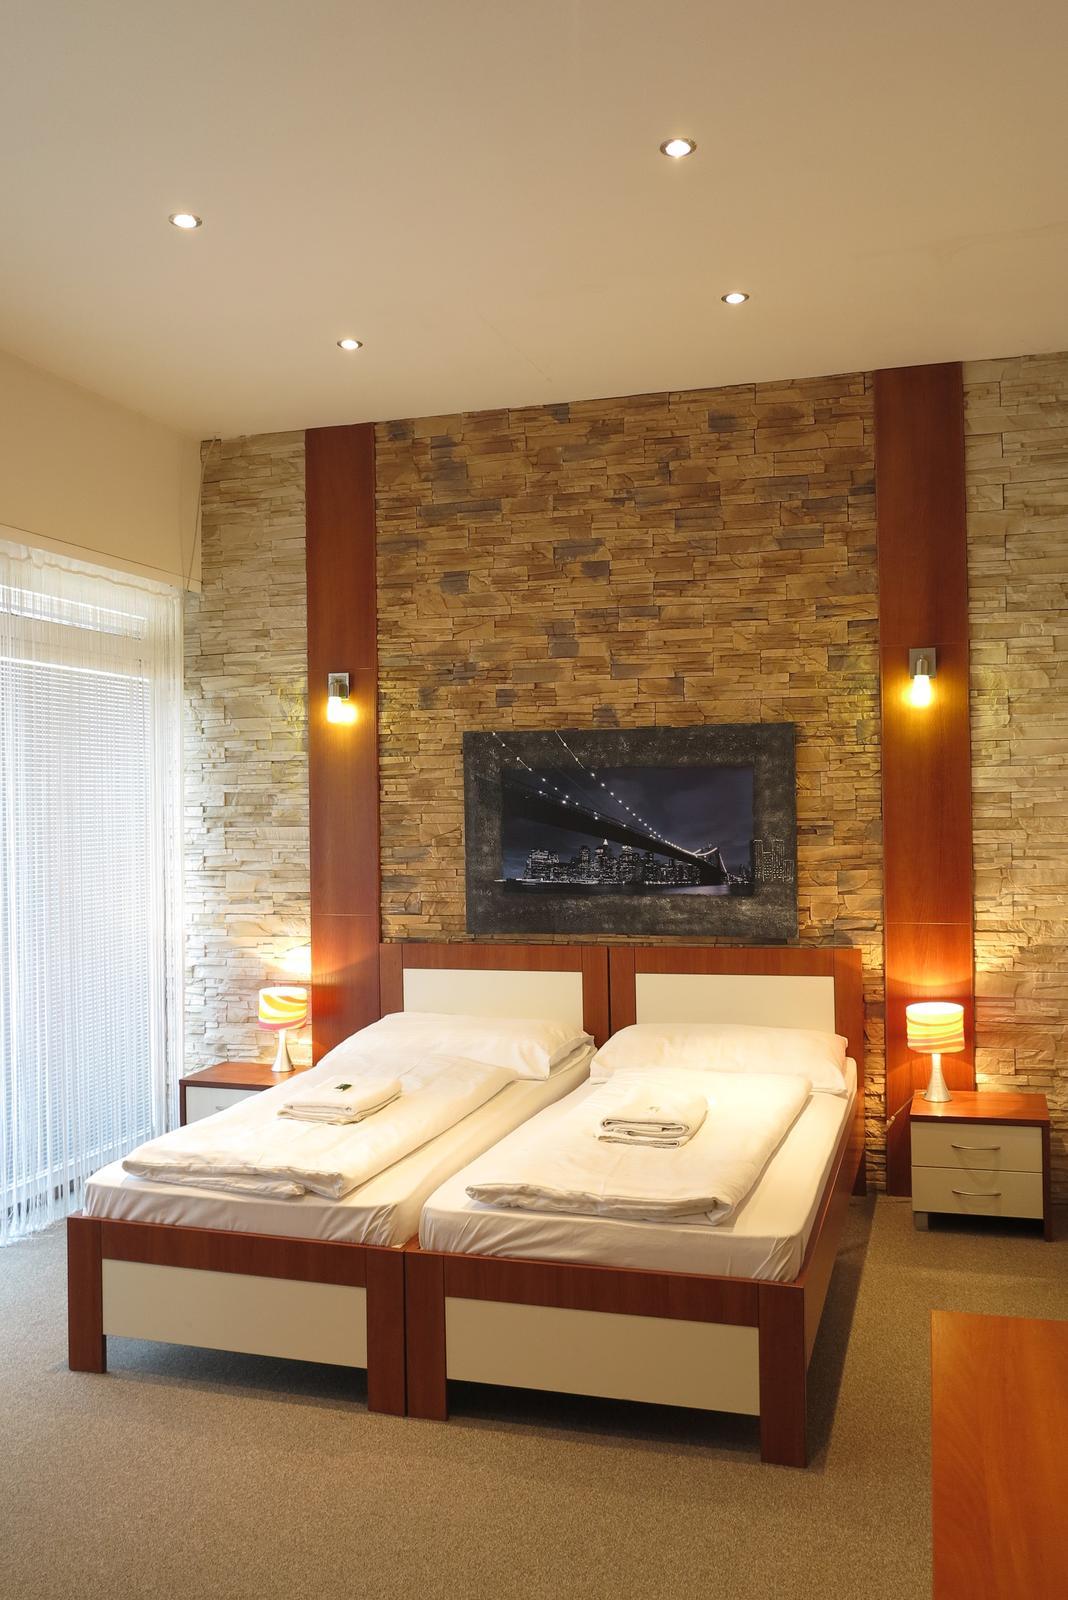 hotel21 - izba pre mladomaželov